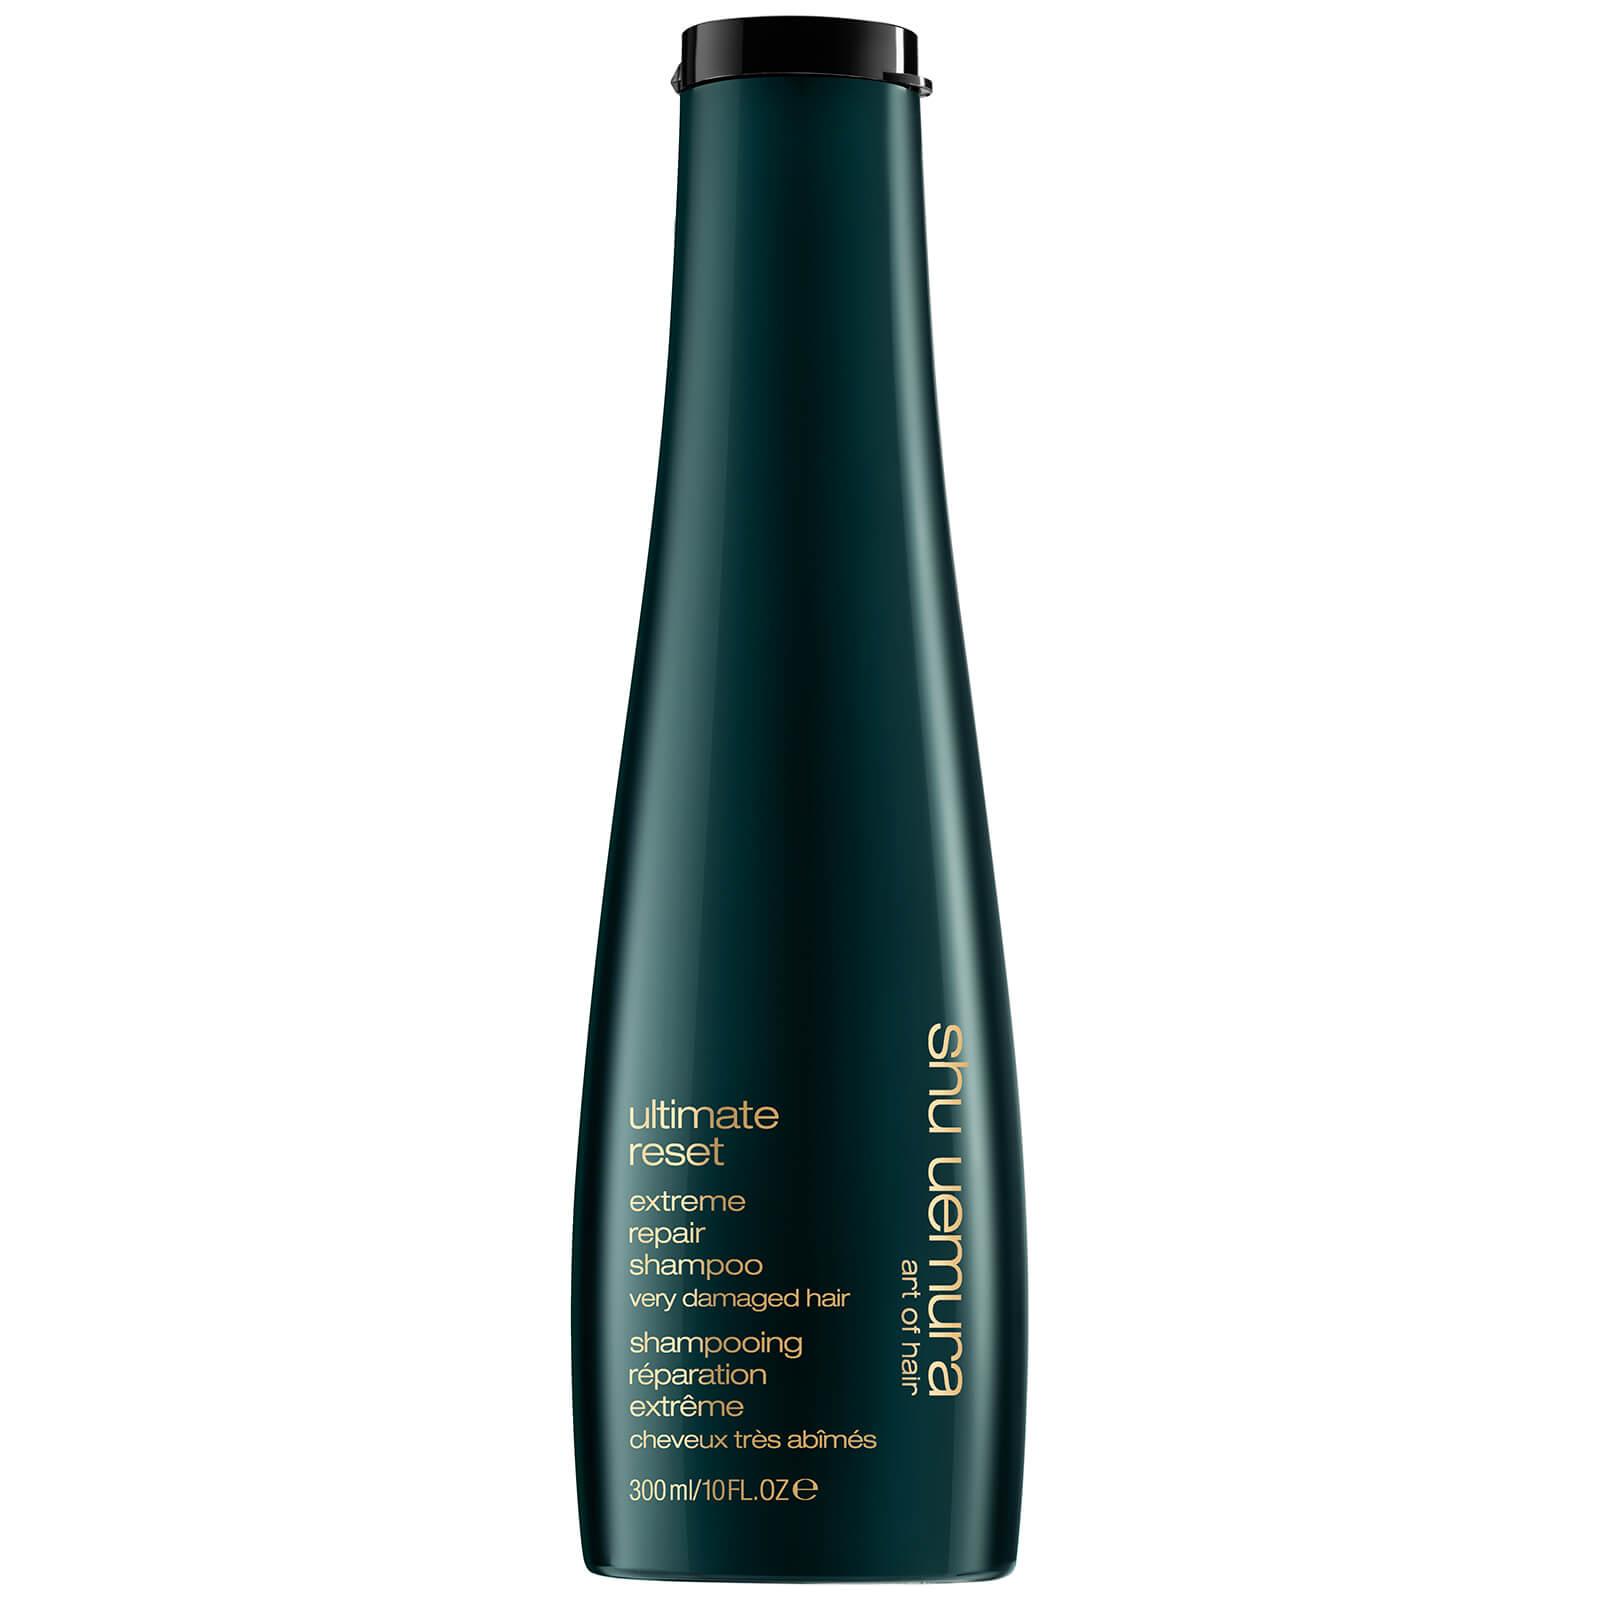 Shu Uemura Art Of Hair Ultimate Reset Shampoo 300ml Hq Hair